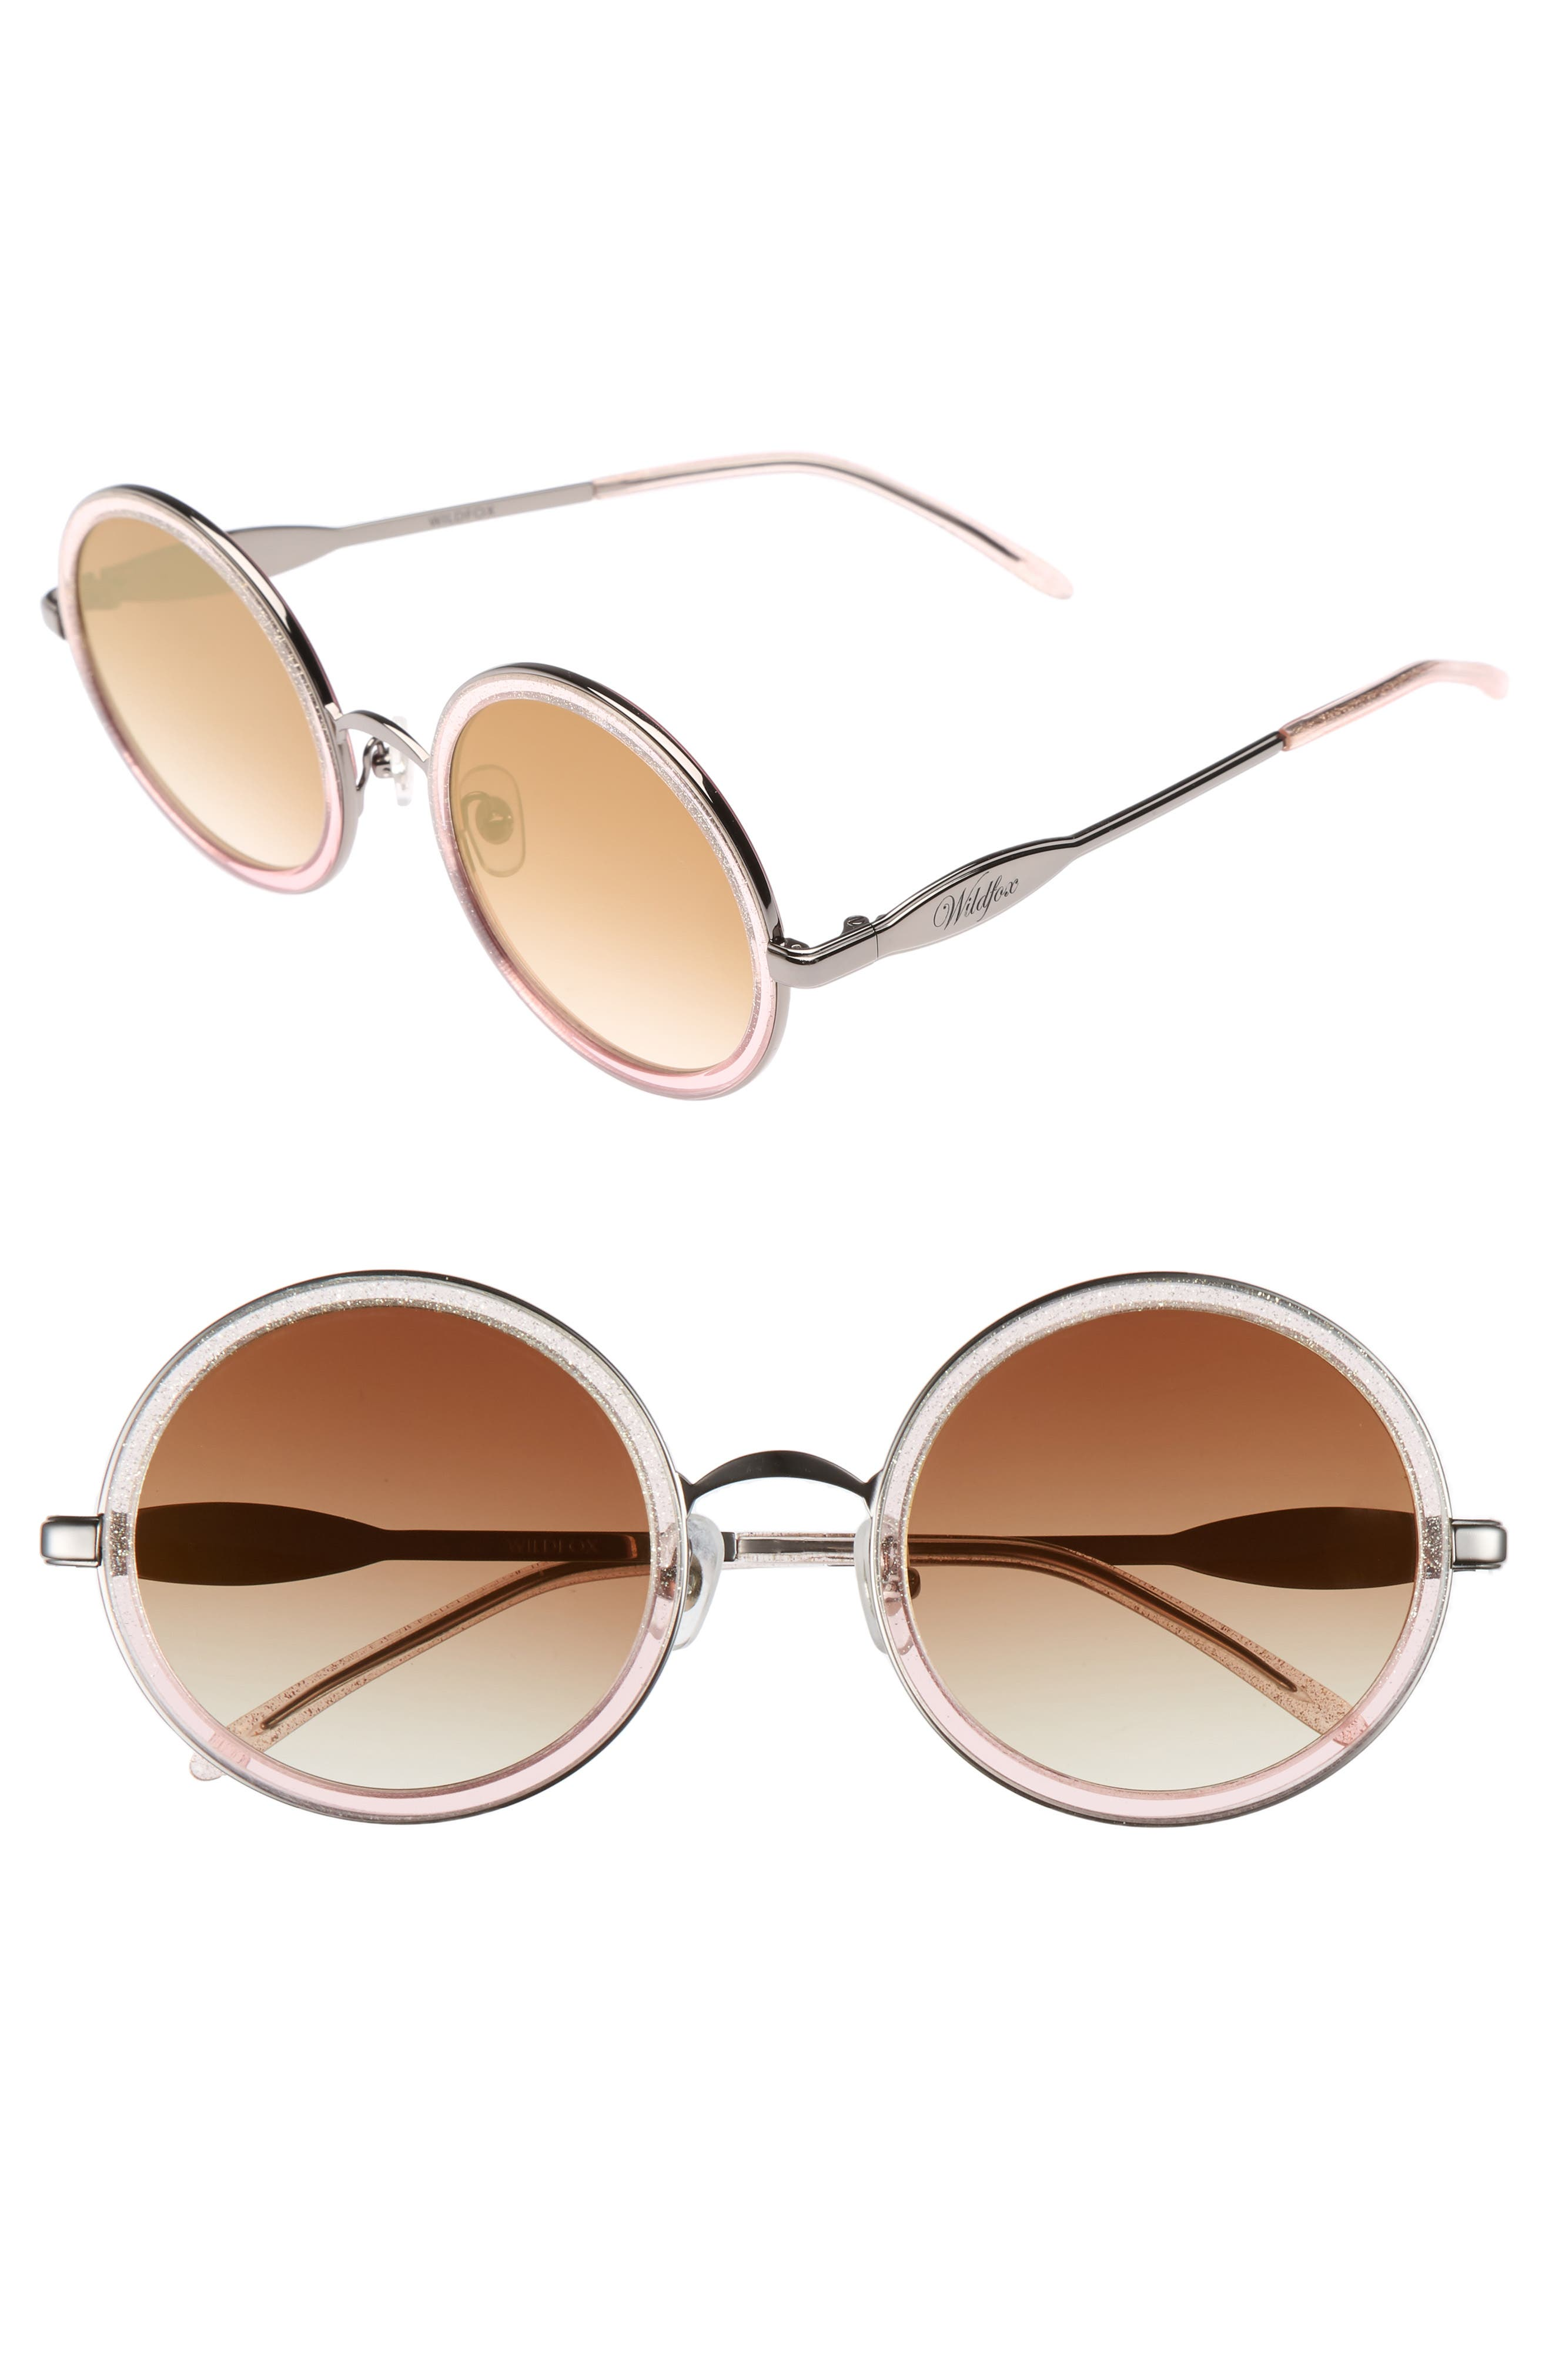 Ryder Zero 49Mm Flat Round Sunglasses - Glitz